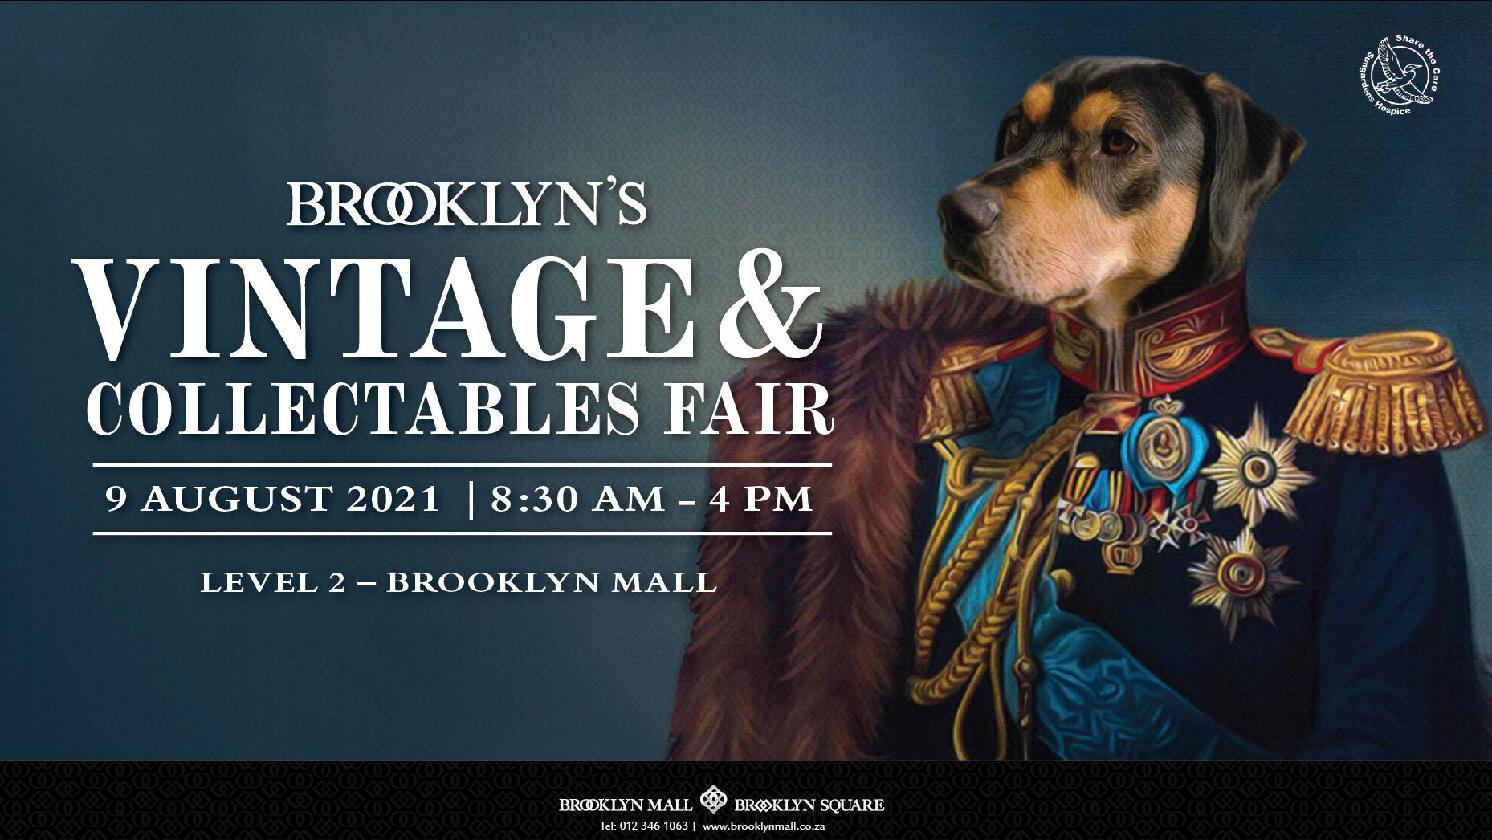 Brooklyn's Vintage & Collectables Fair